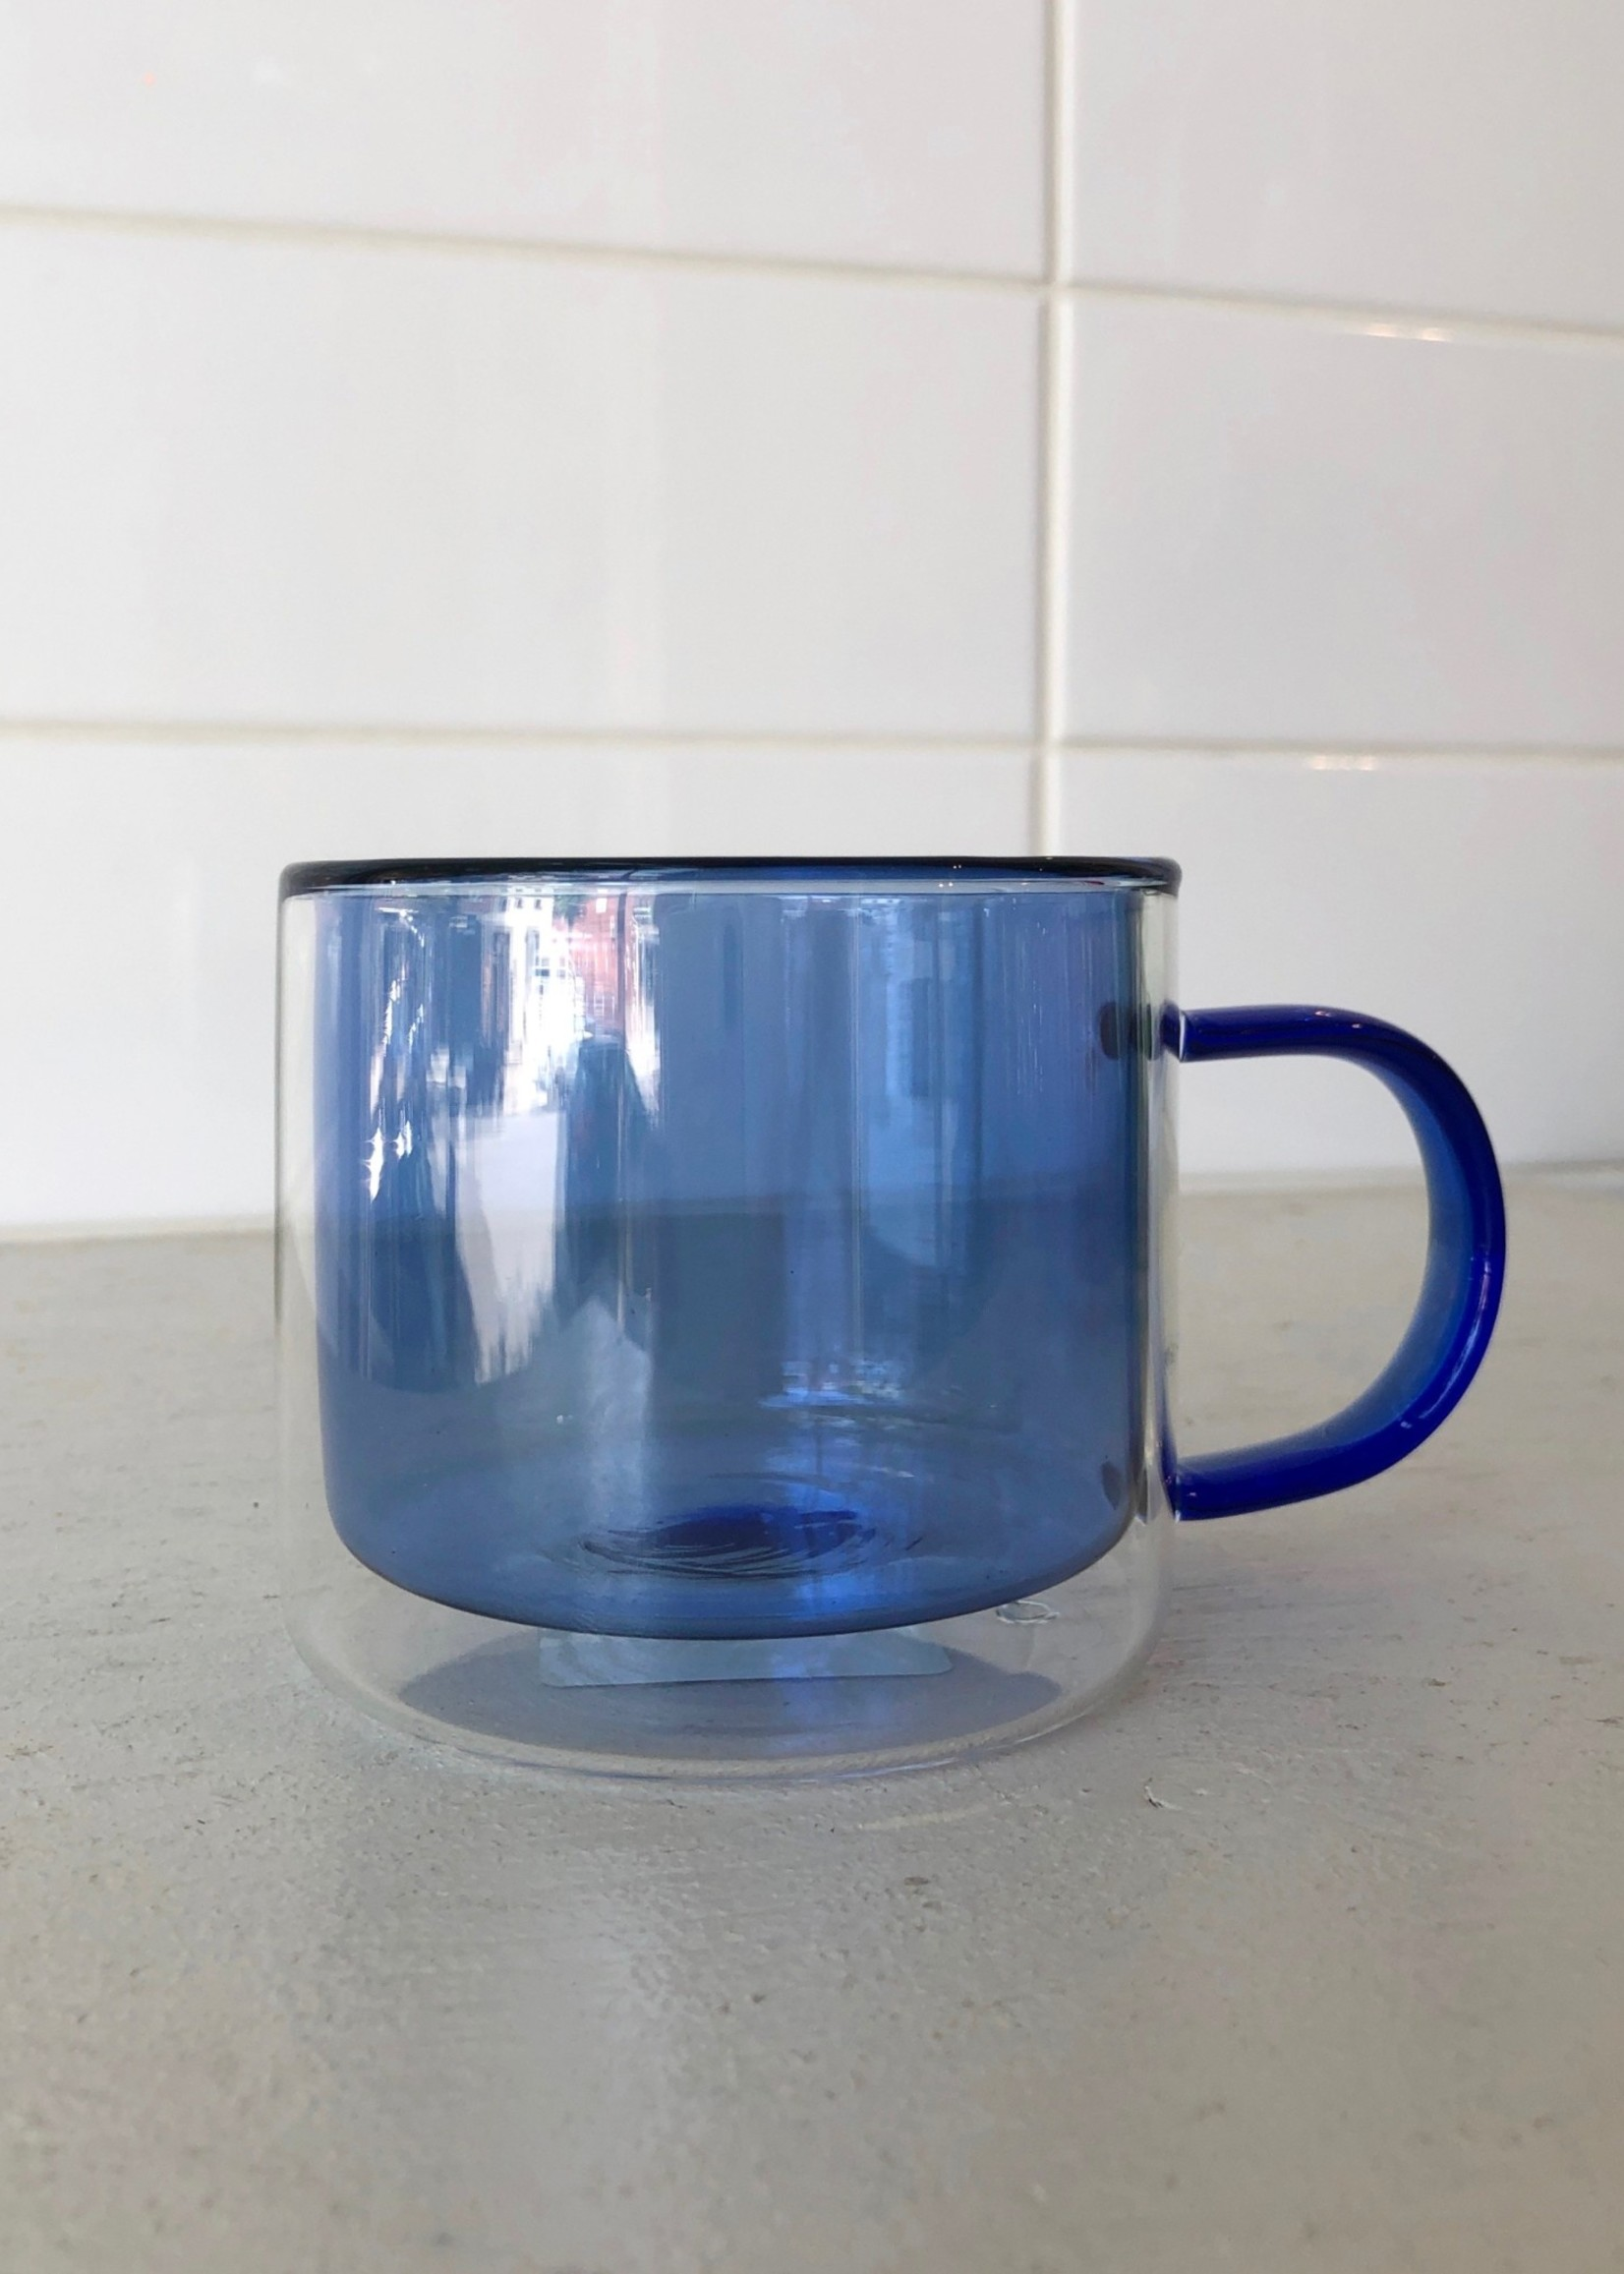 Poketo Double Walled Mug by Poketo